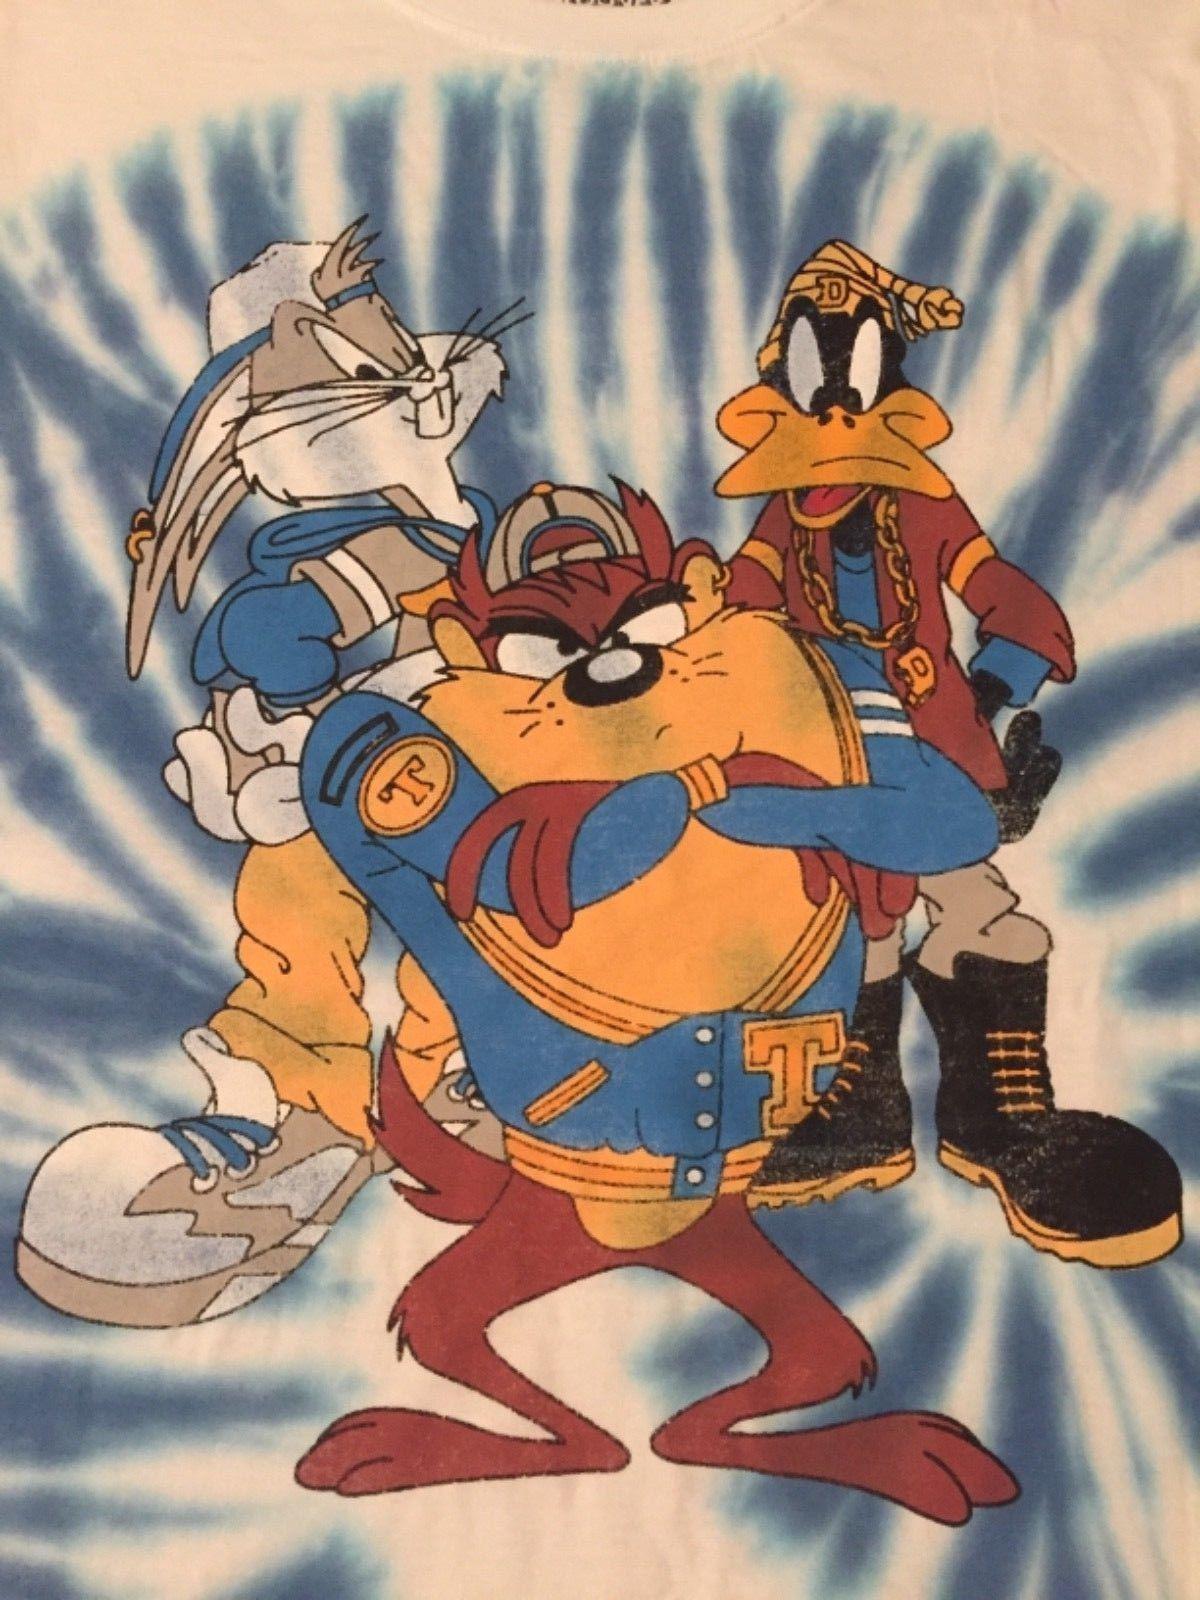 TAZ DEVIL Bugs Bunny DAFFY Duck LOONEY Tunes SPACE Jam MENS New Tank Top T-Shirt